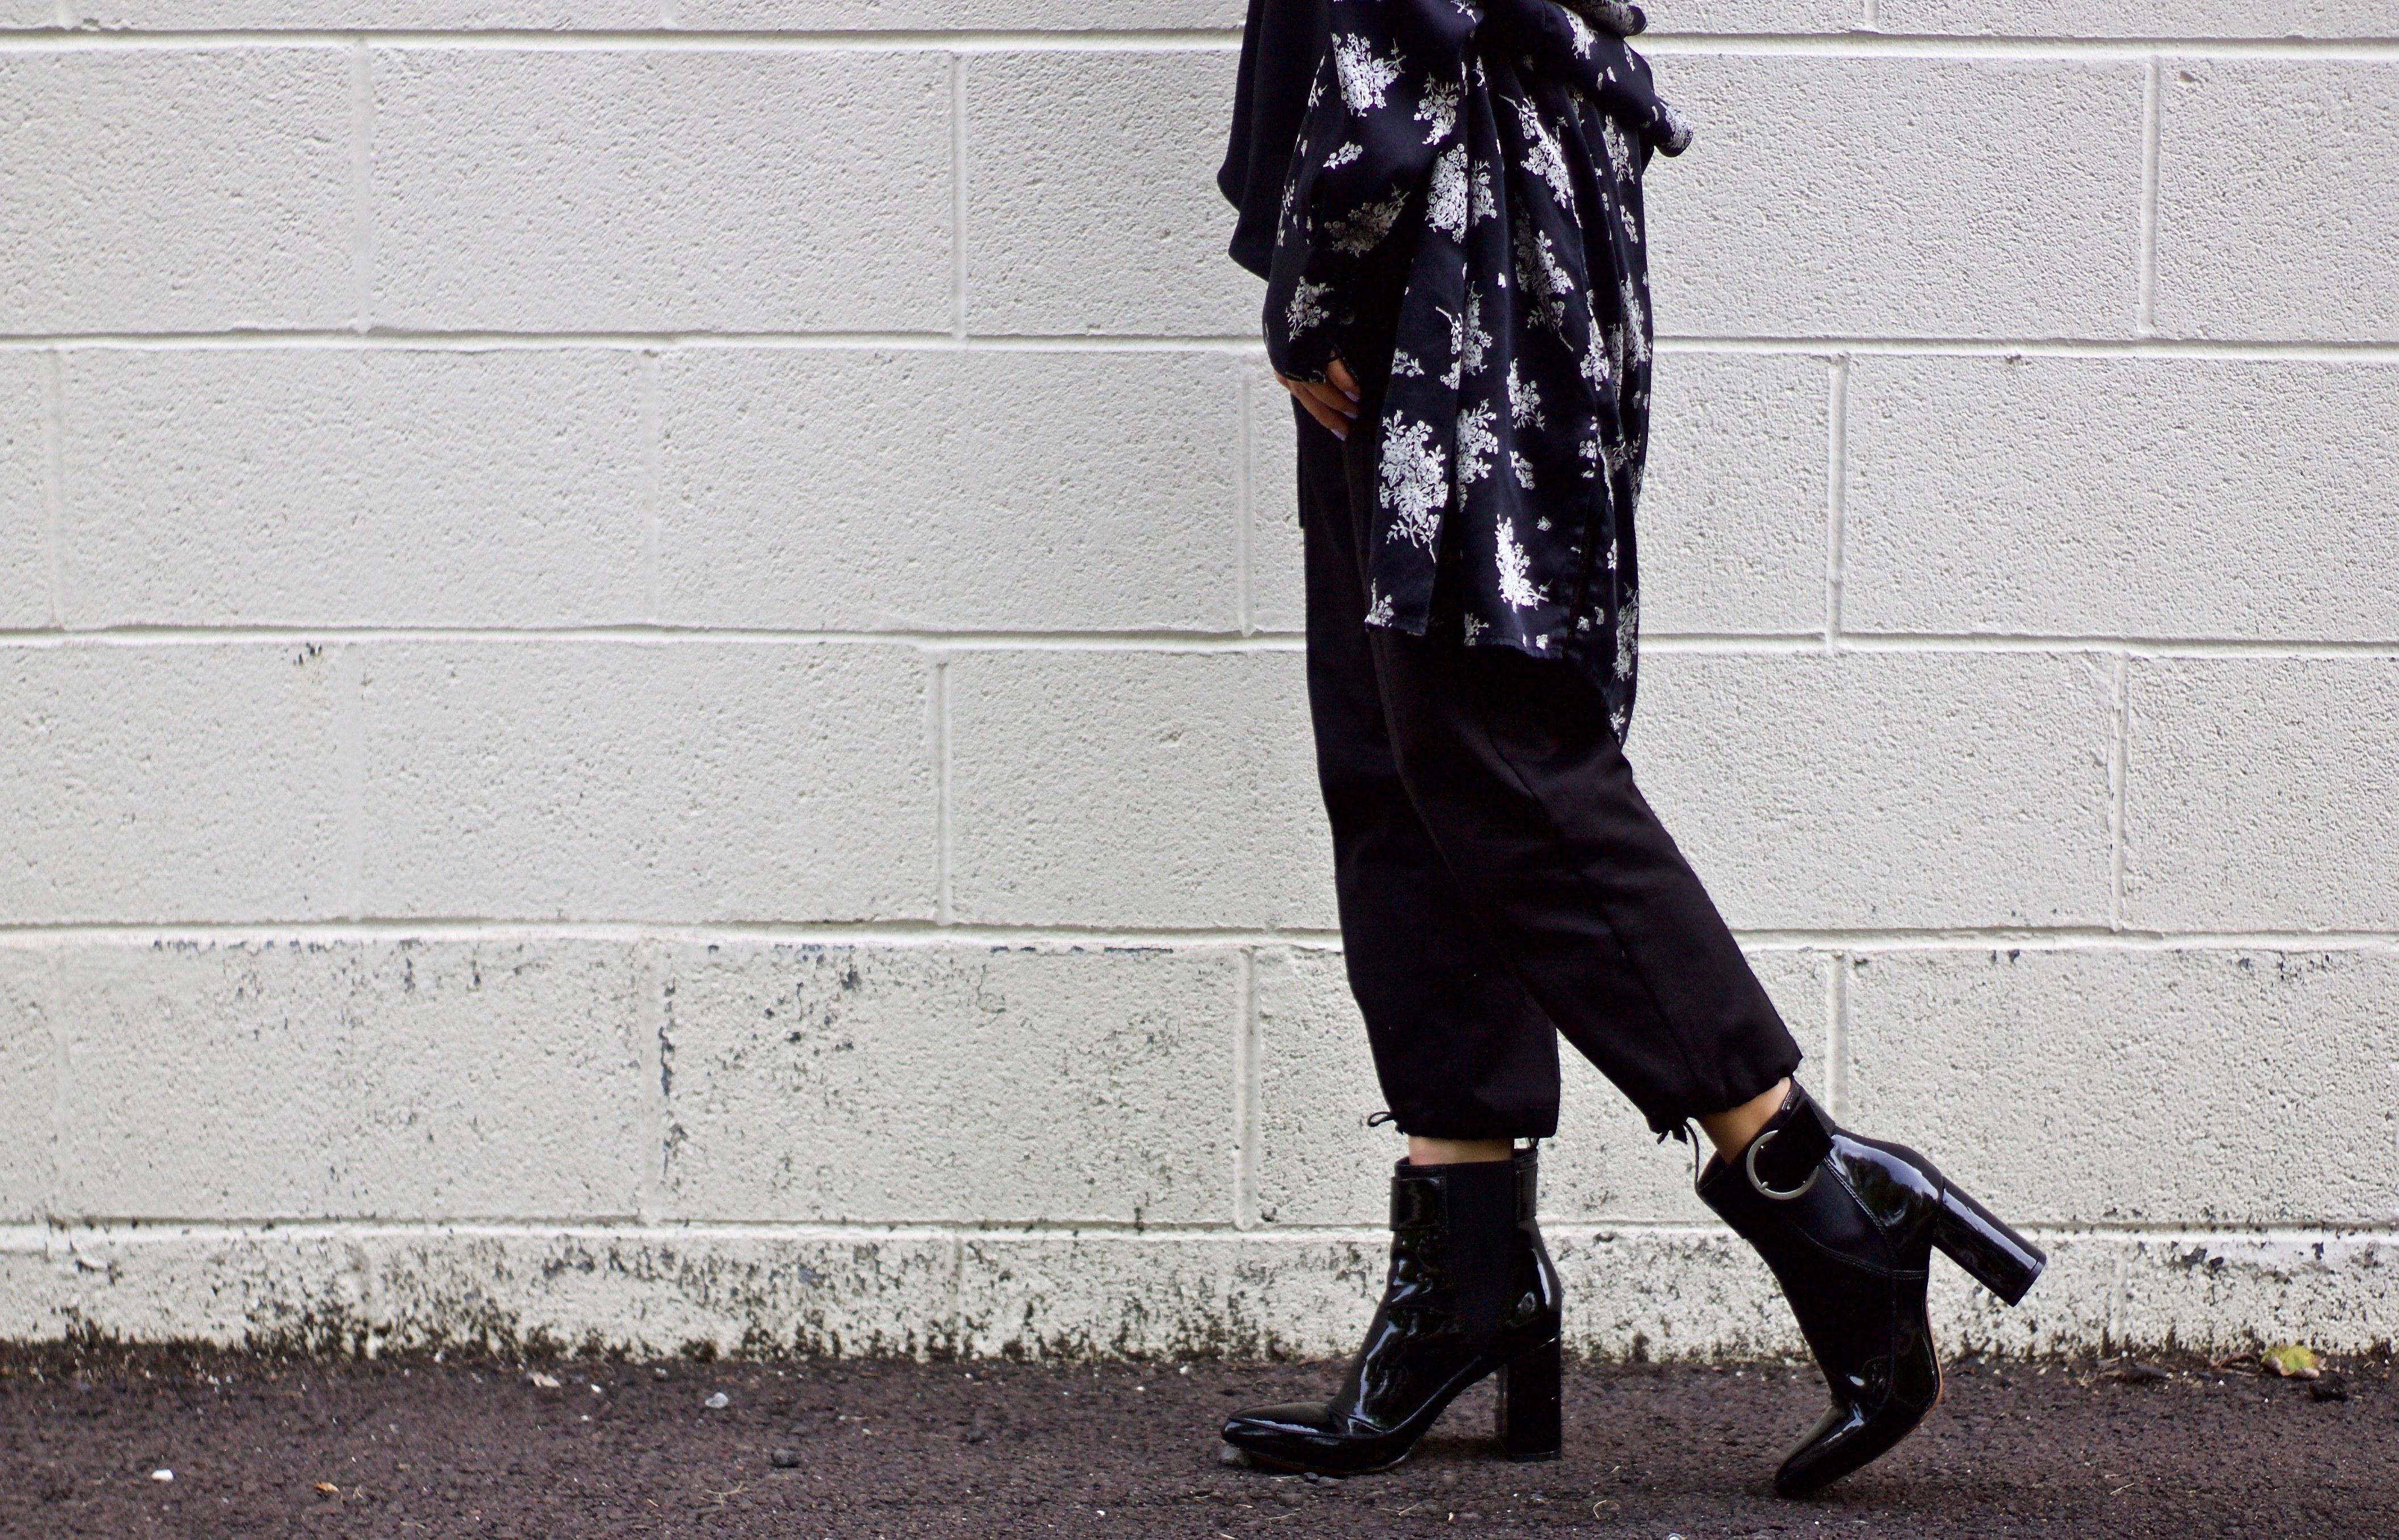 Model Bridesmaid Hijab Batik Fmdf Fall Wardrobe Staple Black Ankle Boots Enclothed Cognition